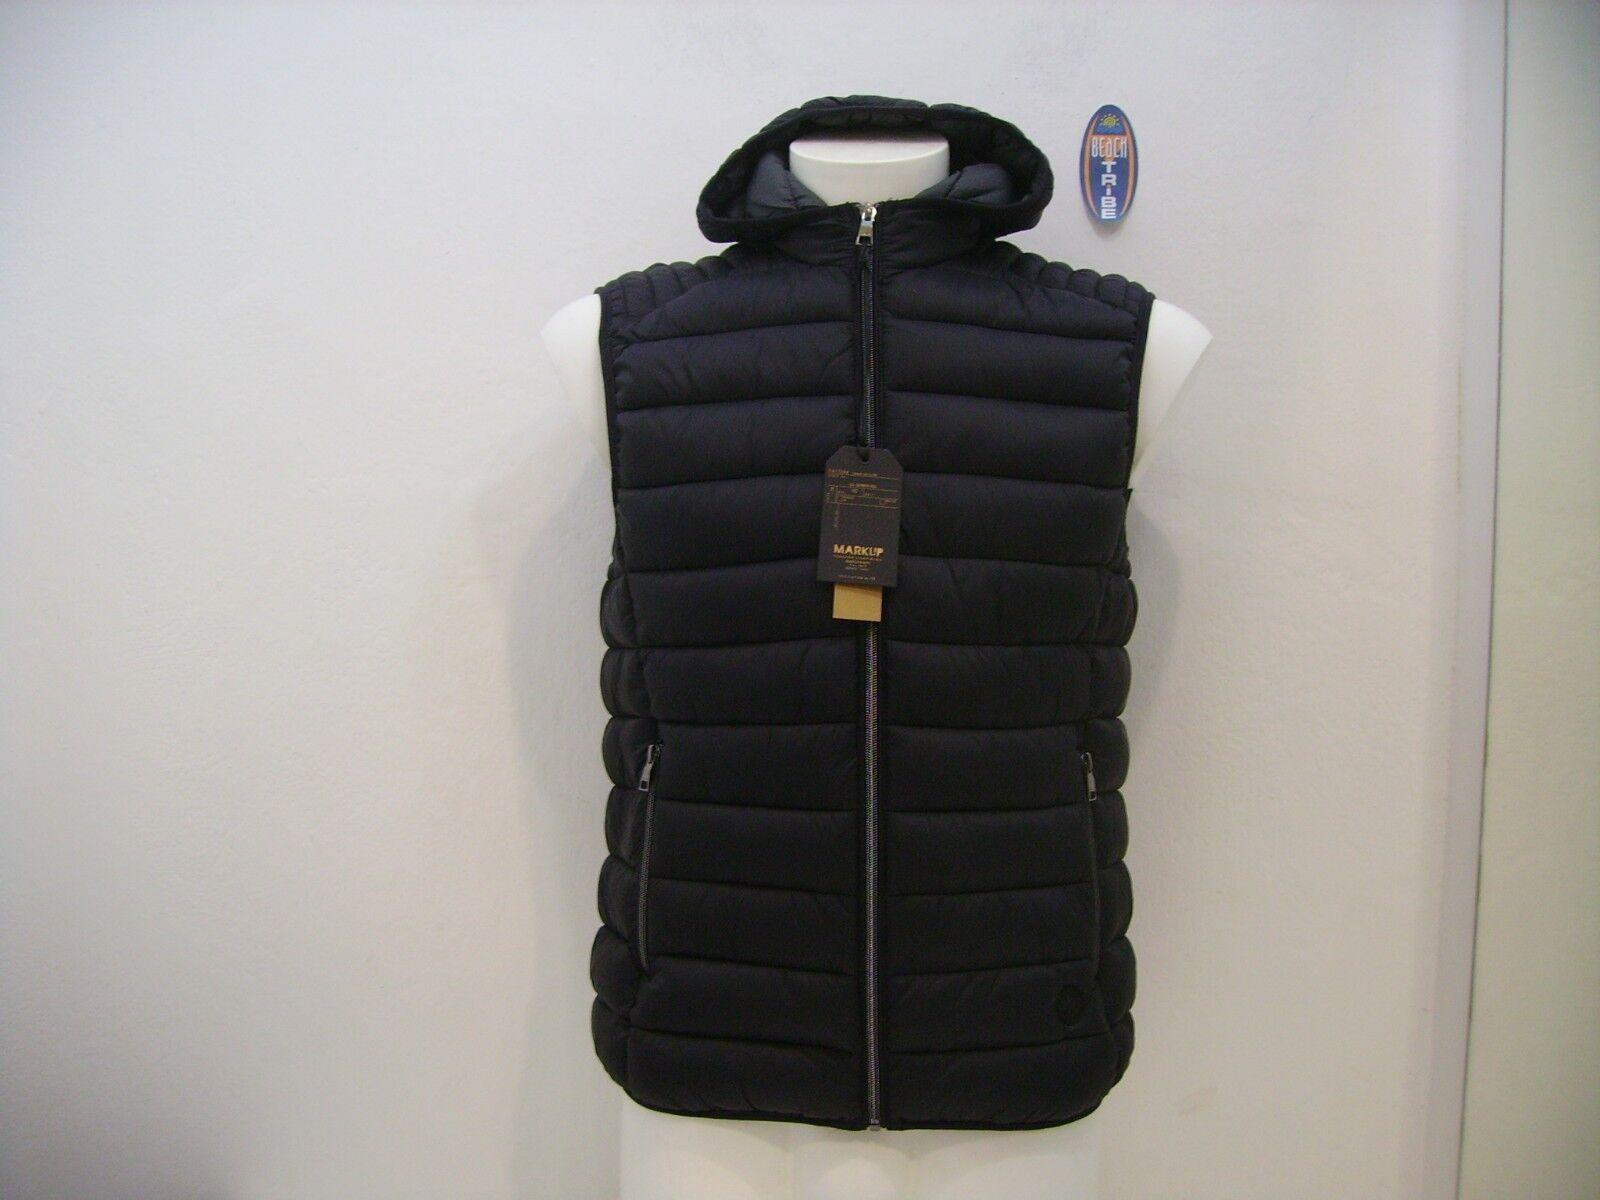 Herren Abzugshaube Basic Ärmellos Jacke Markup M49412